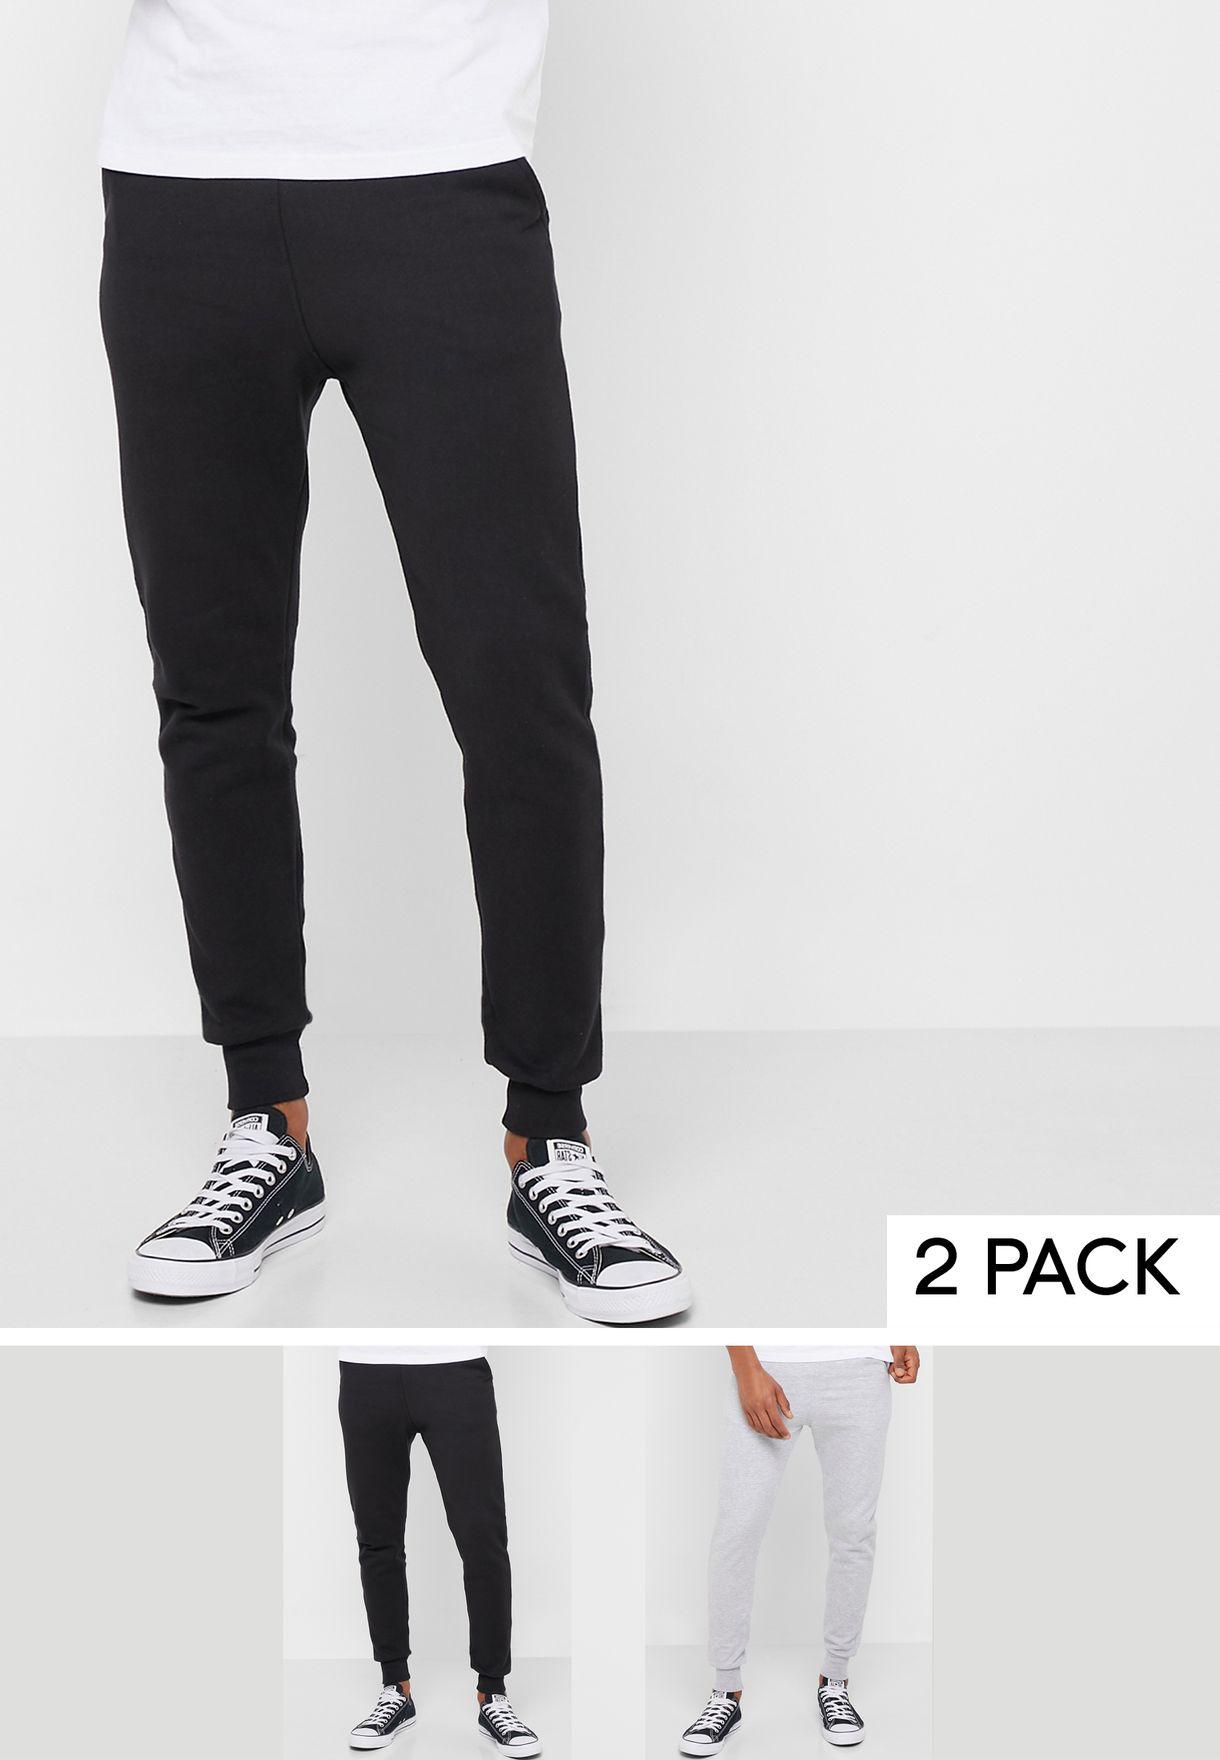 2 Pack Sweatpants